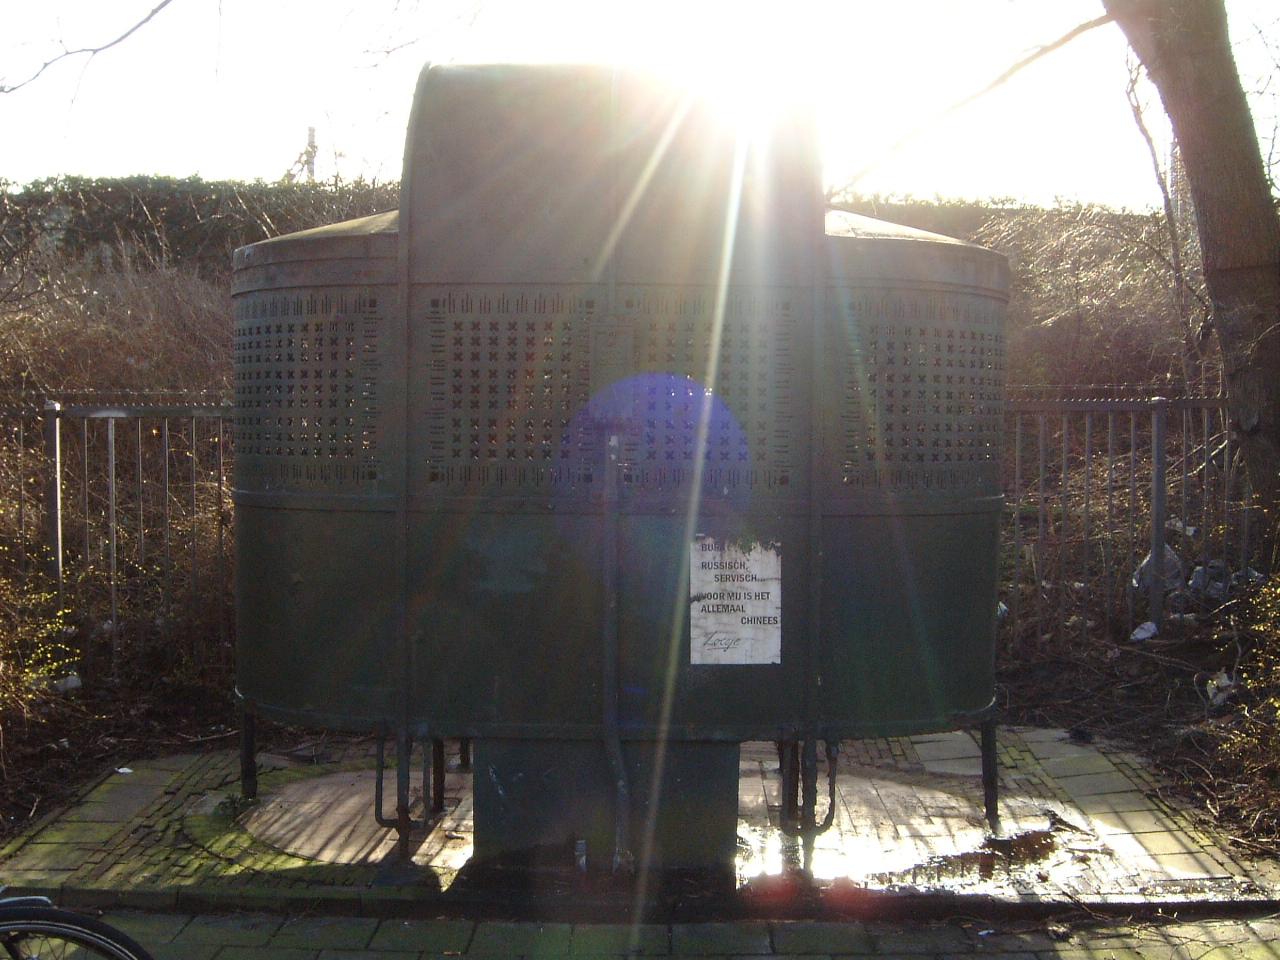 maartent sun shining over a public urinal